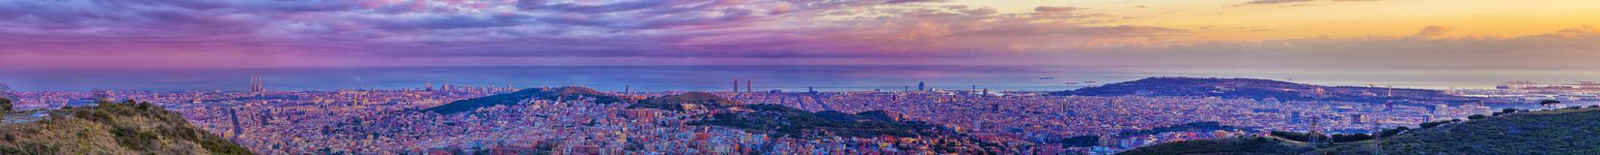 Barcelona skyline panorama extra large. Huge panorama of Barcelona skyline at dusk. More than 2 metres long royalty free stock photo